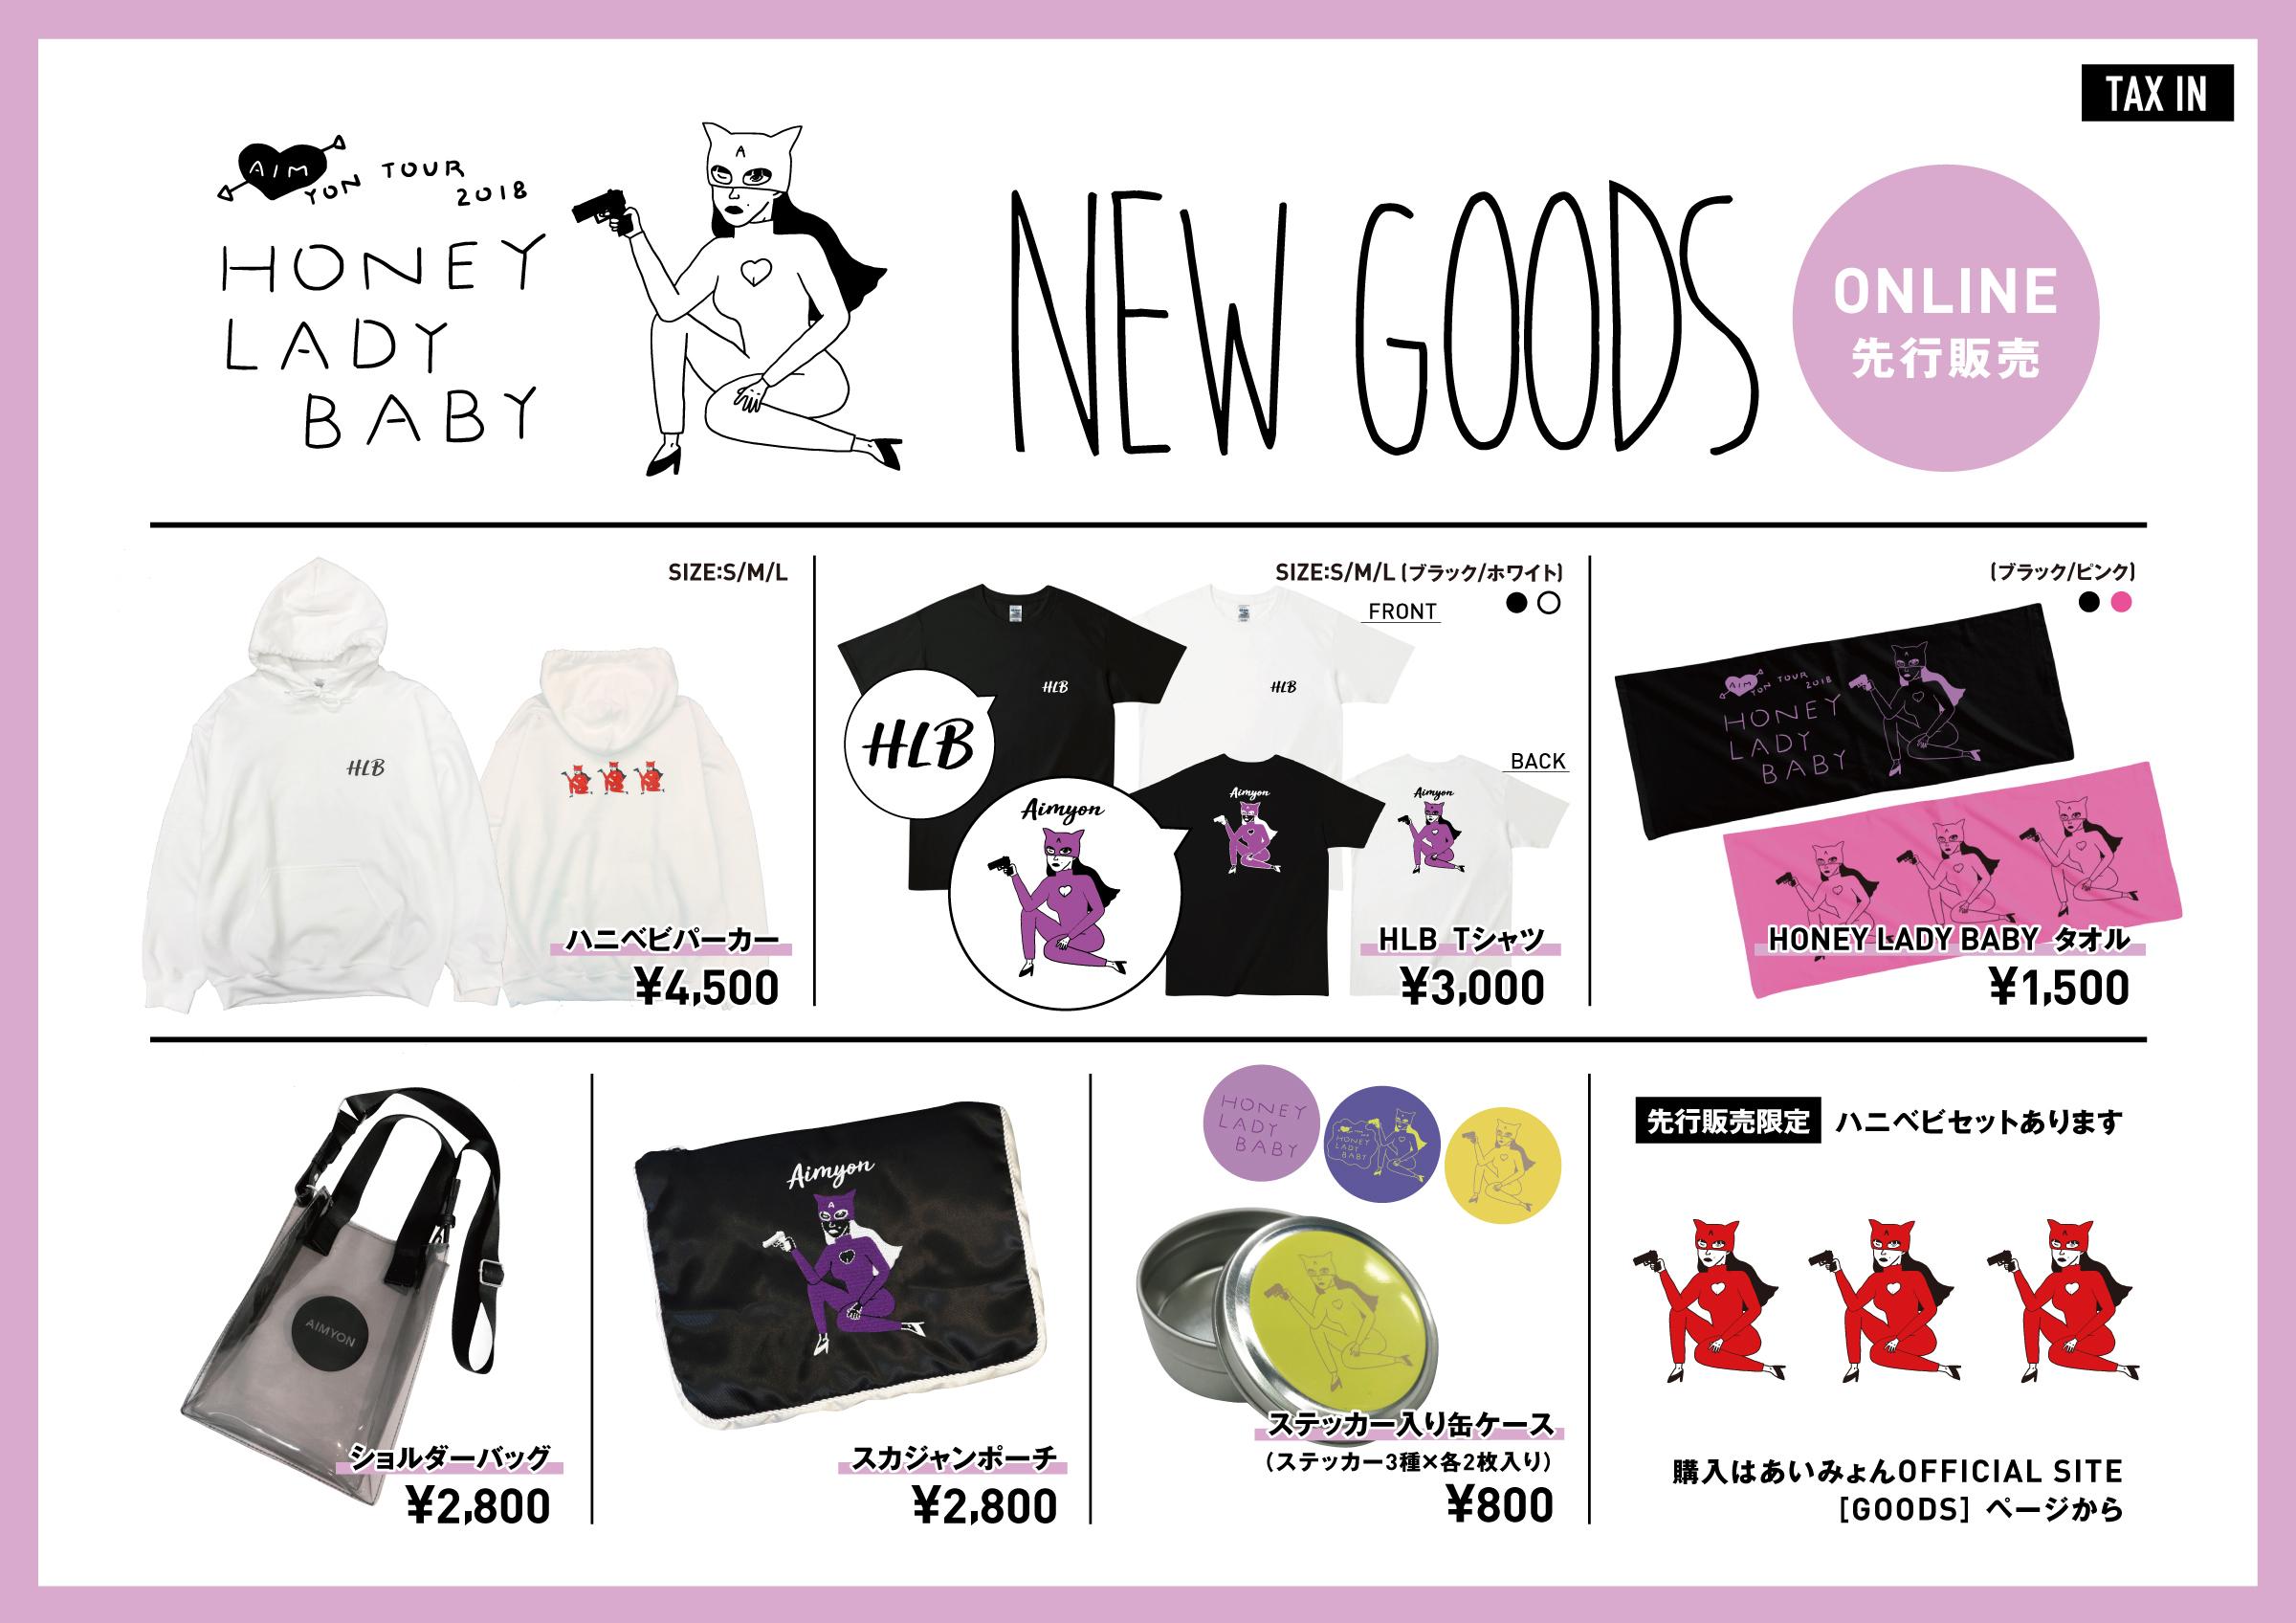 AIMYON TOUR 2018 ,HONEY LADY BABY, オフィシャルグッズonline先行販売のお知らせ|あいみょん OFFICIAL  SITE